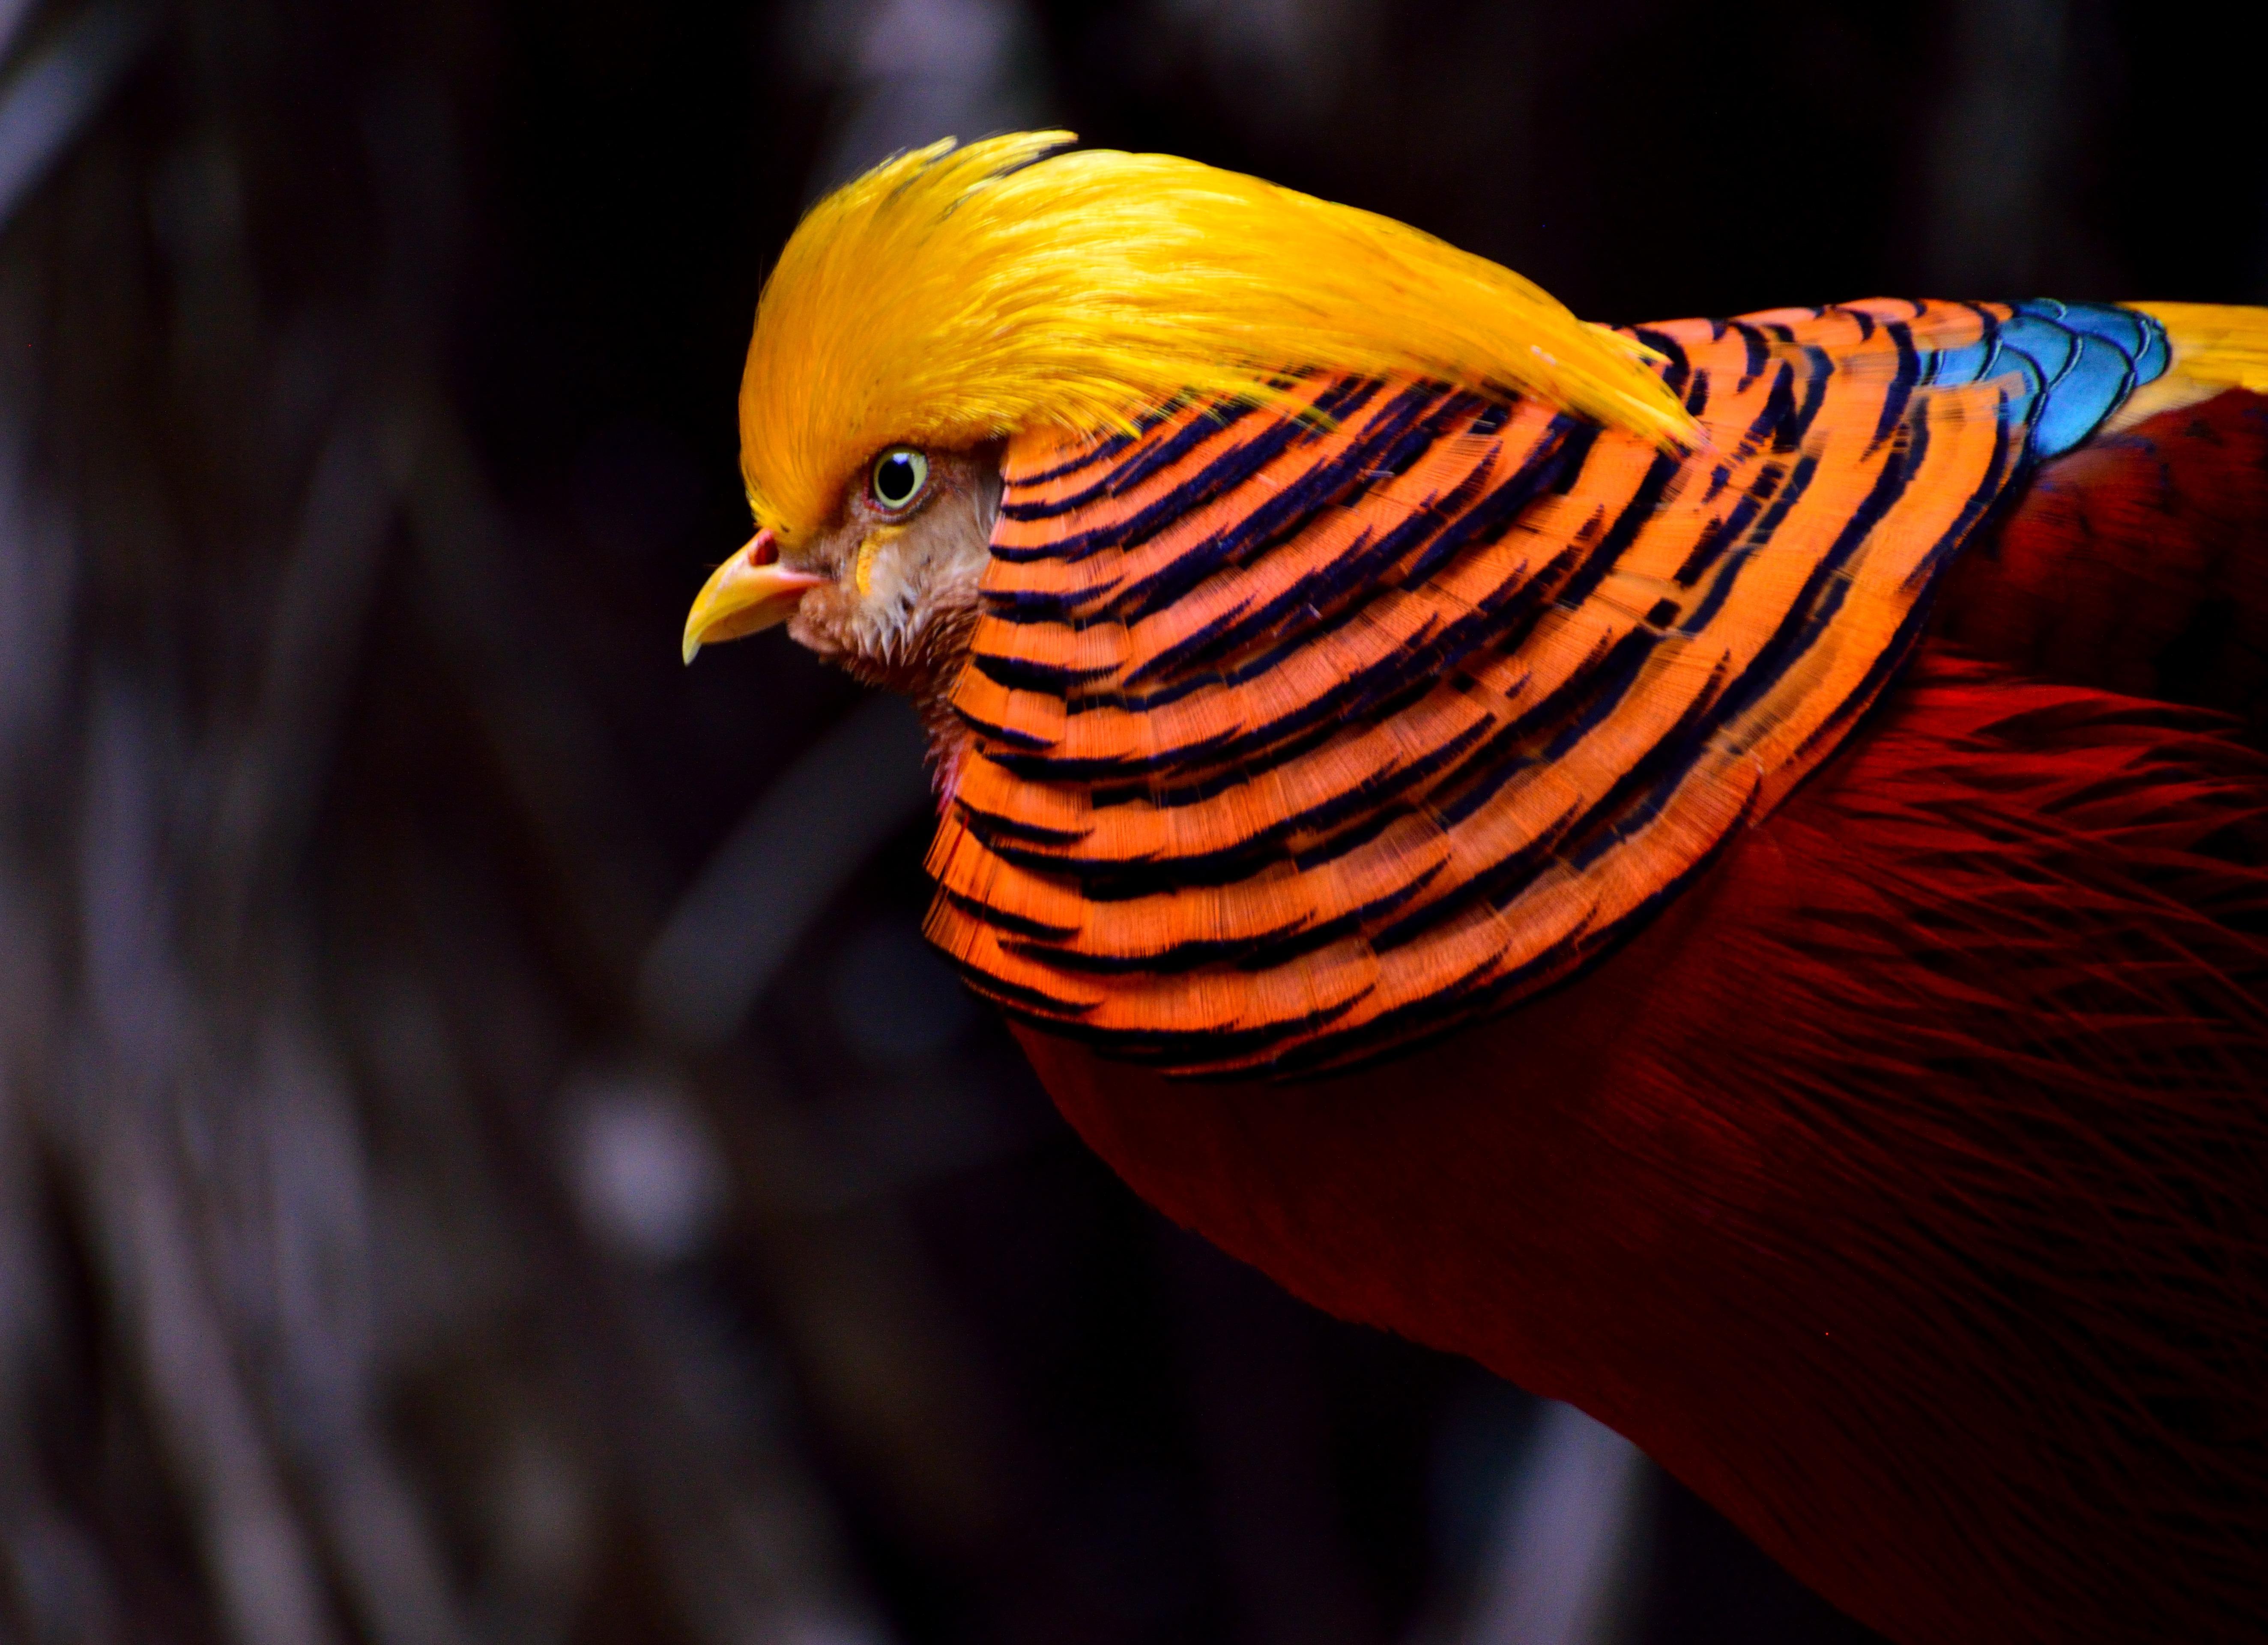 красота птиц фото и названия лермонтово